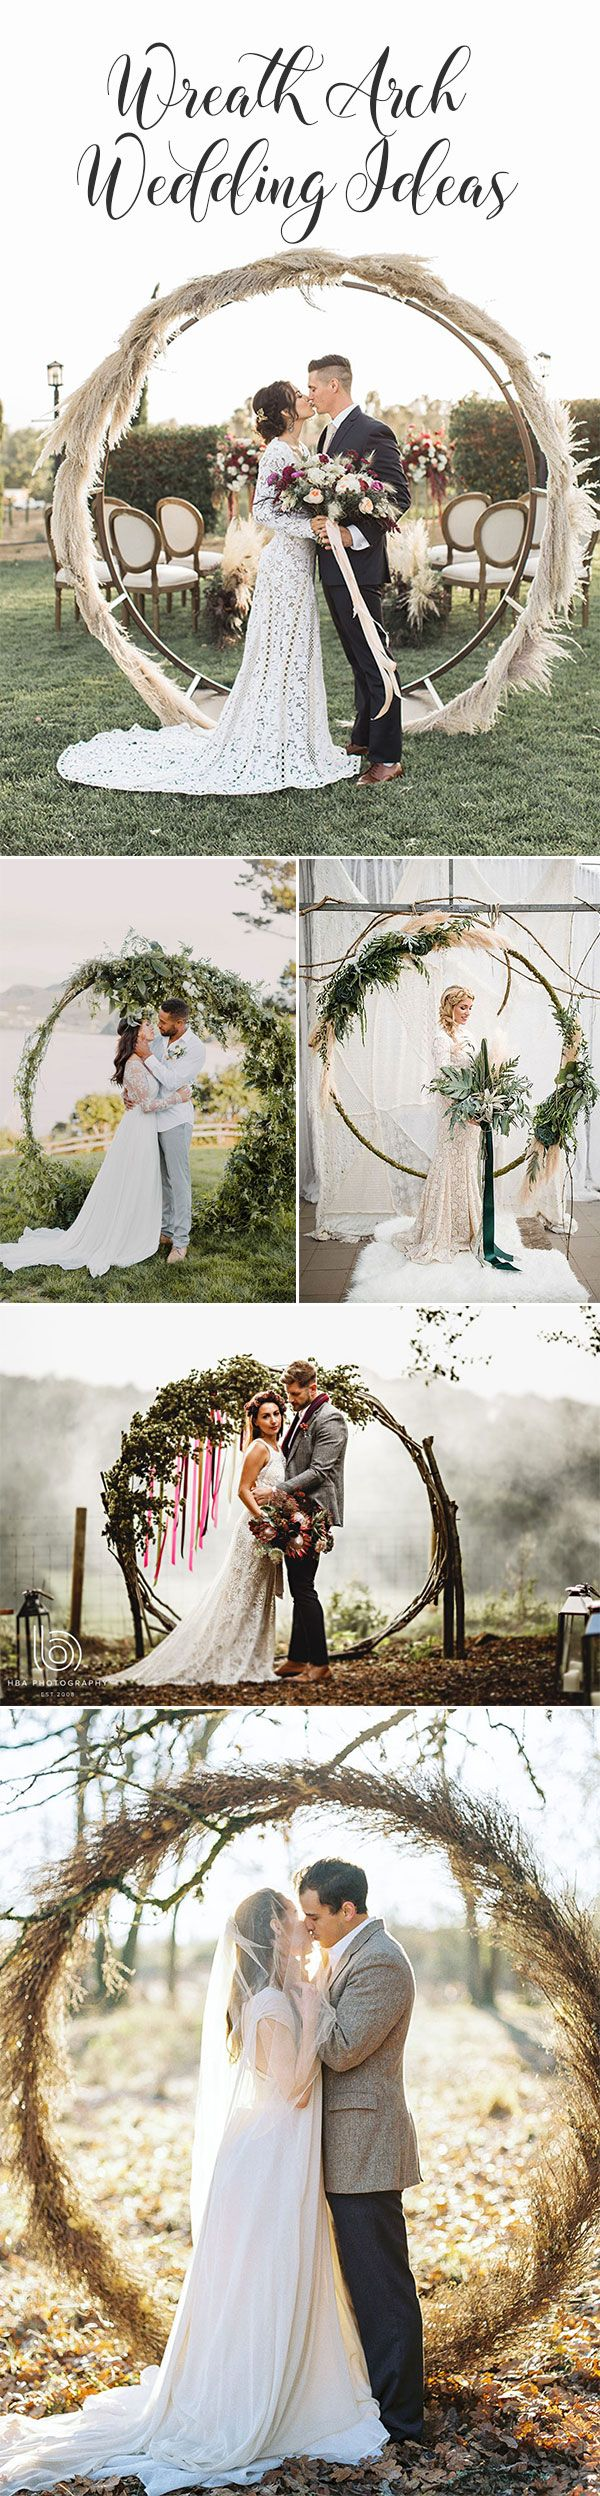 Trendy-wreath-wedding-ceremony-arch-decoration-ideas-for-2018